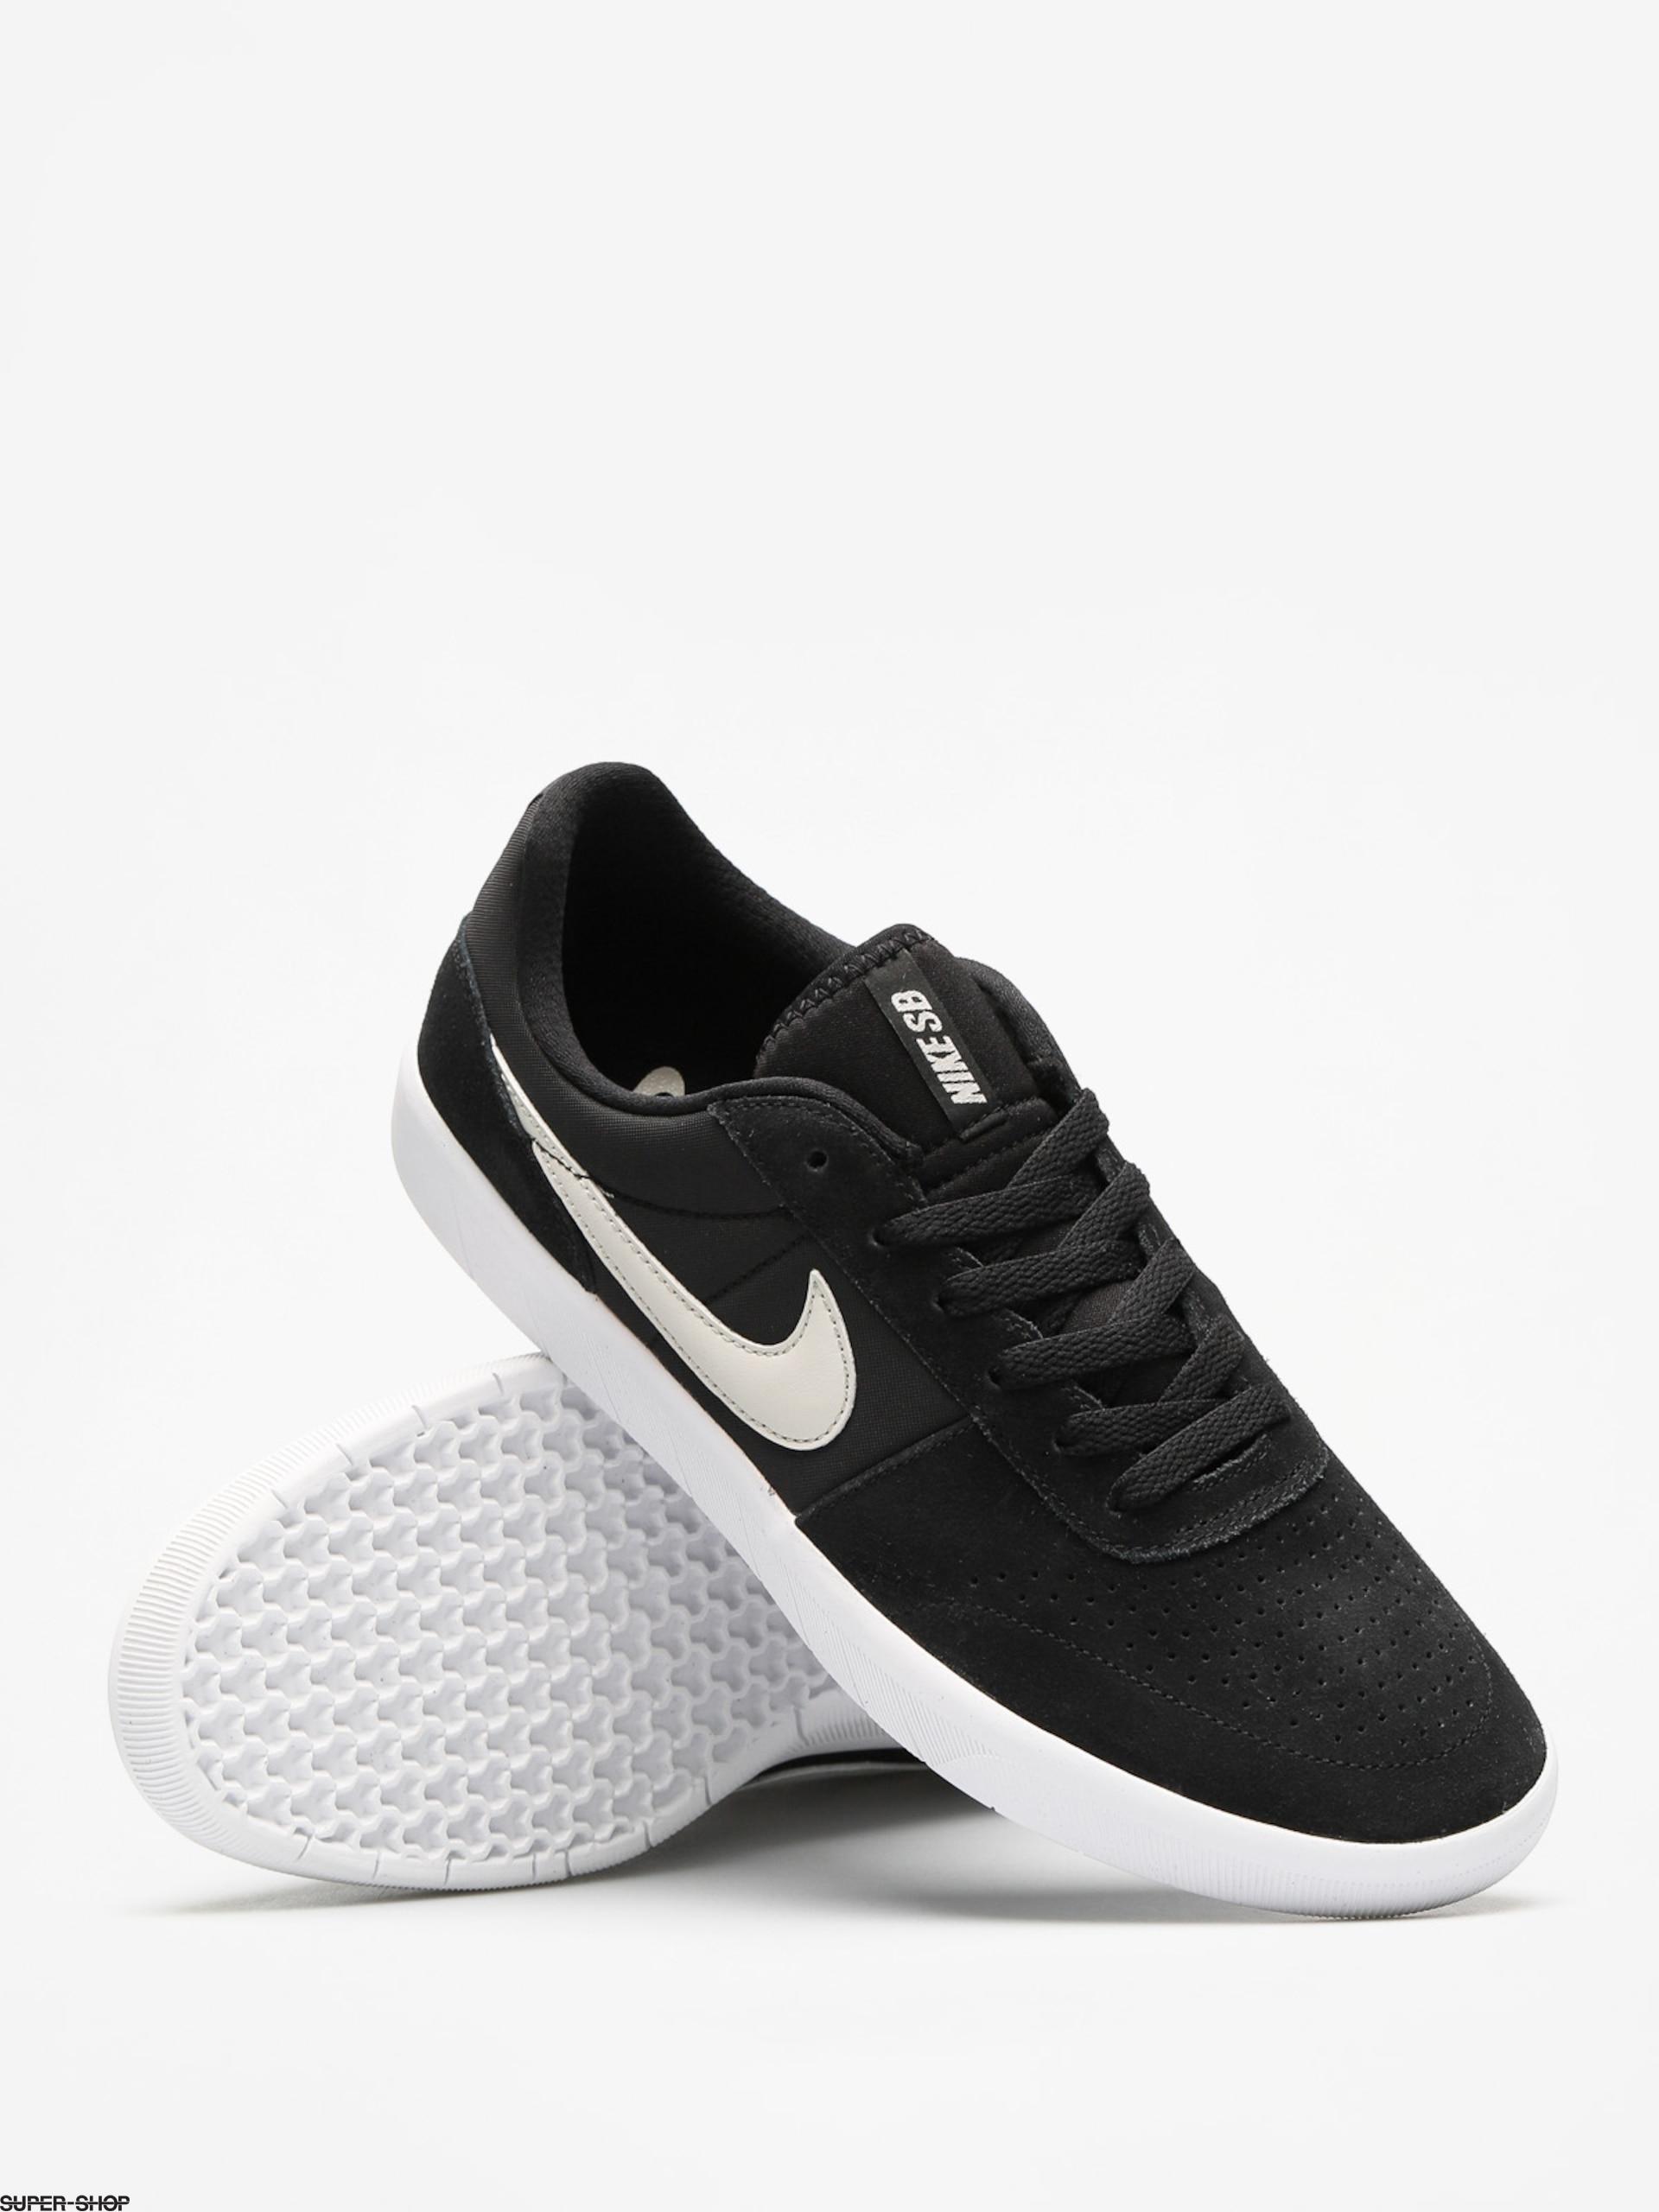 sale retailer 51368 25af0 Nike SB Shoes Sb Team Classic (black light bone white)